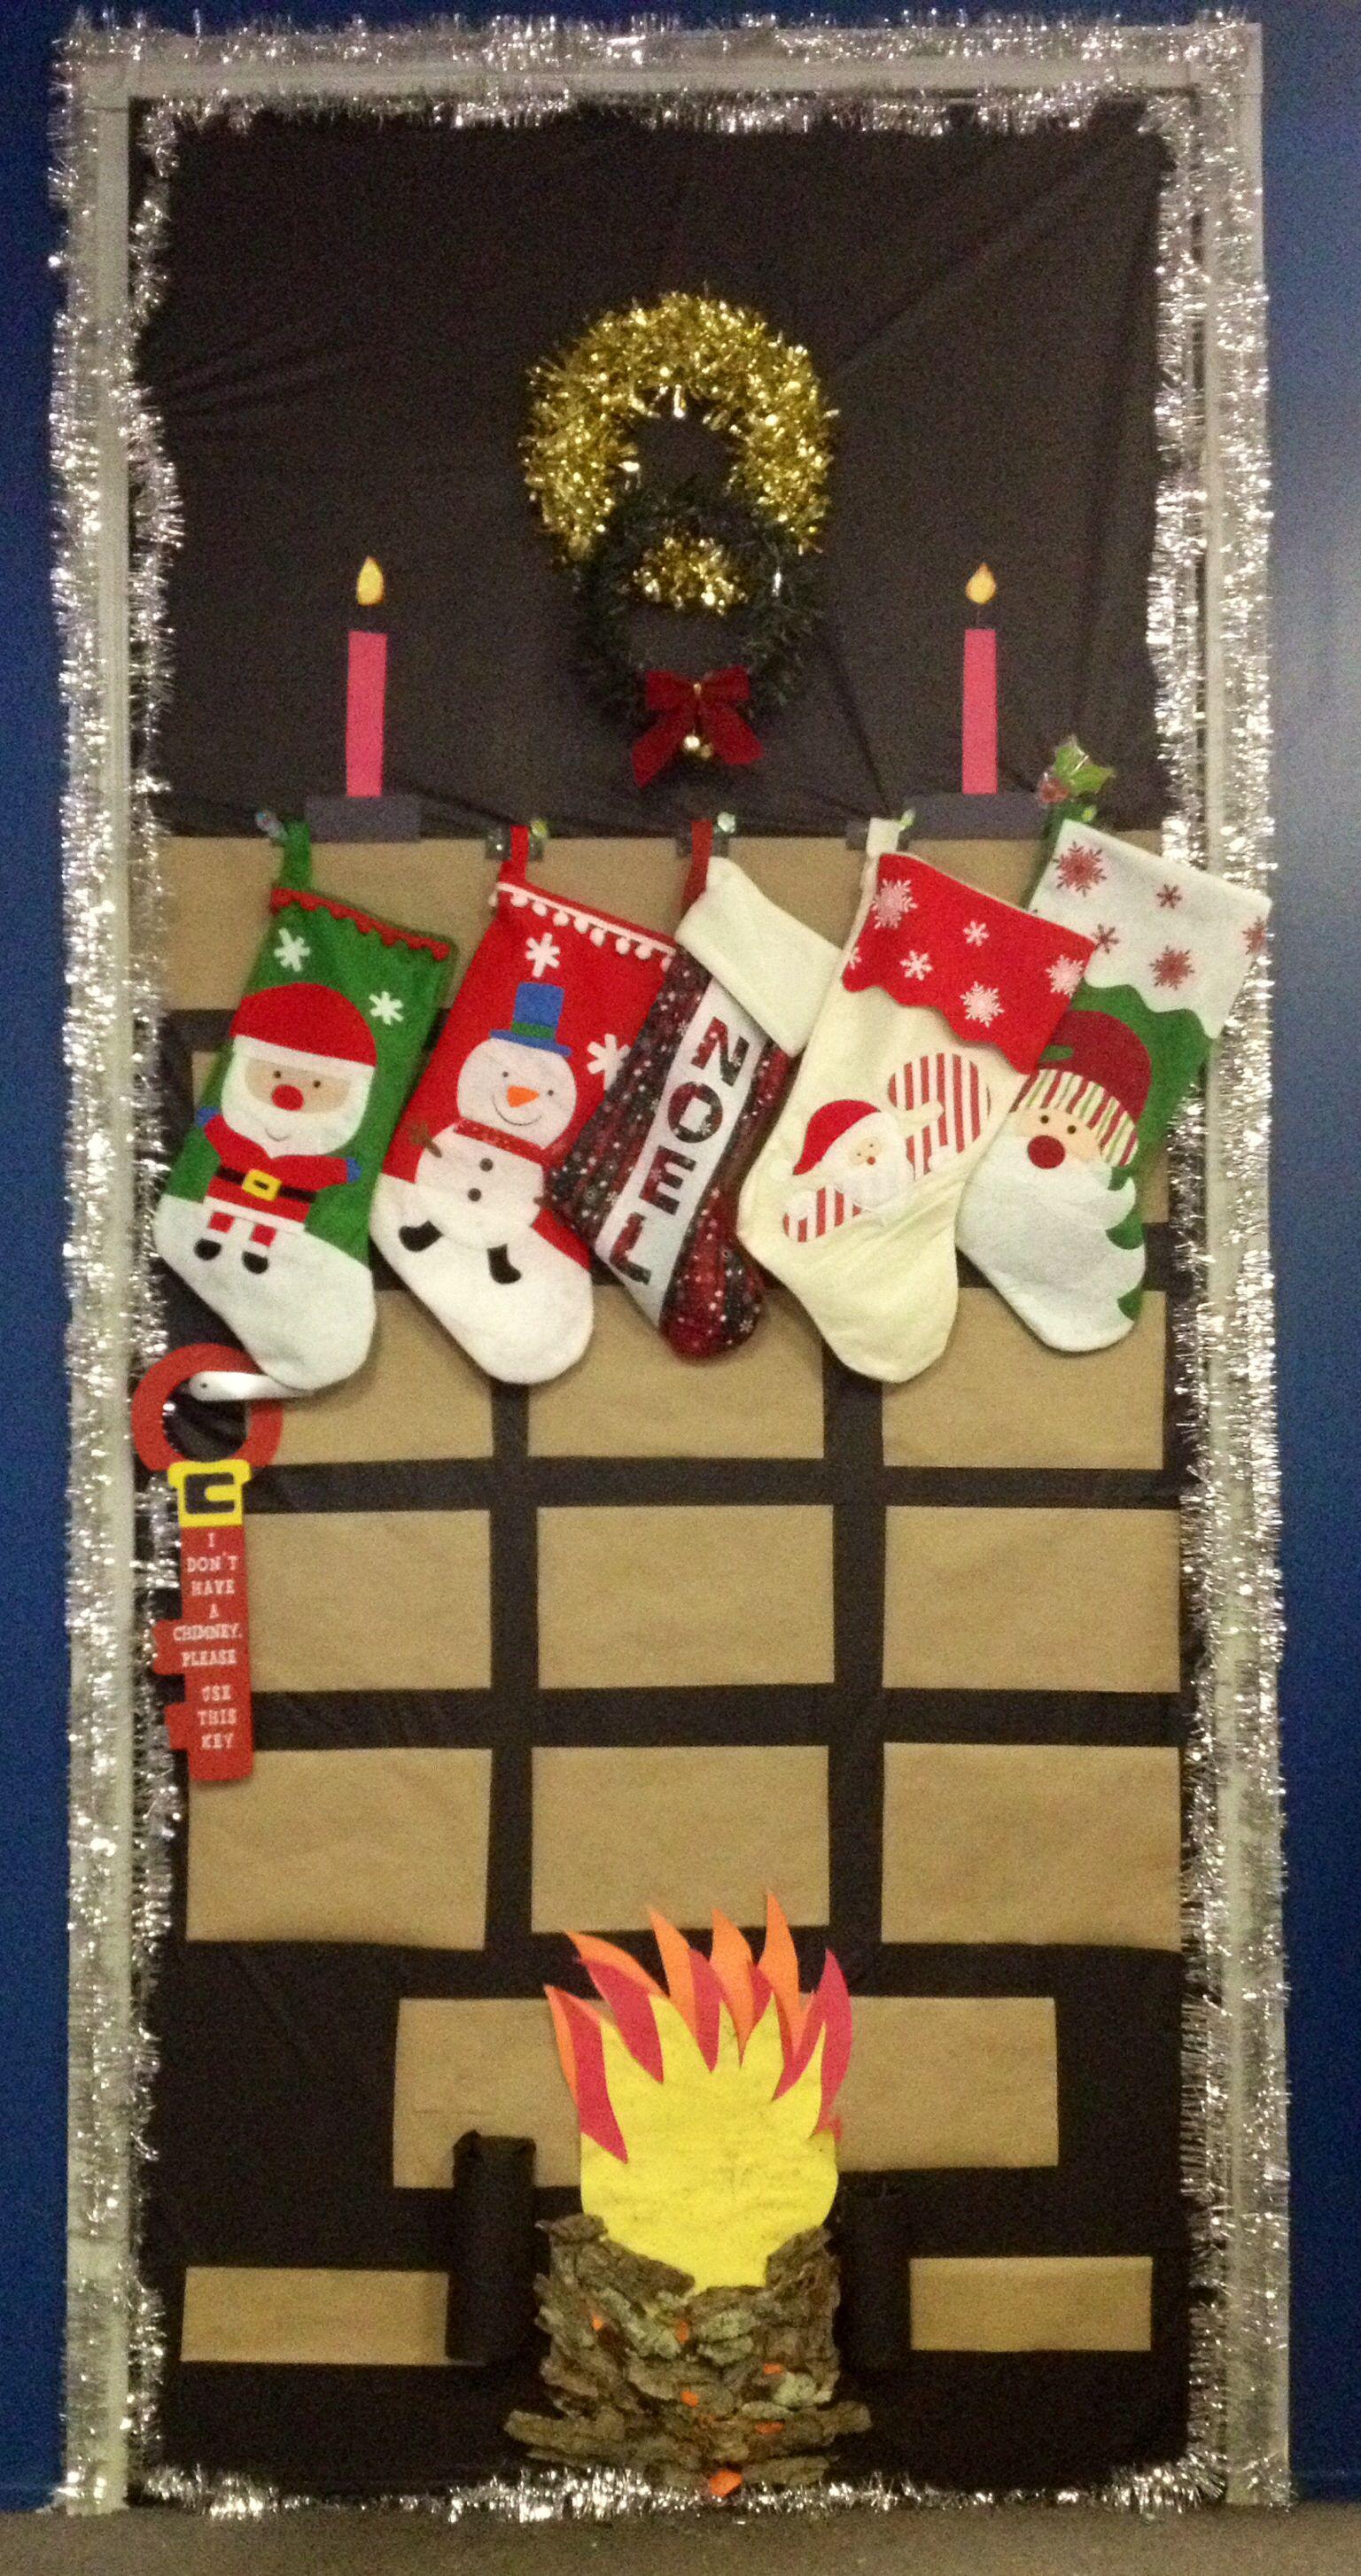 Christmas door decorating contest fireplace - Christmas Door Decoration Contest